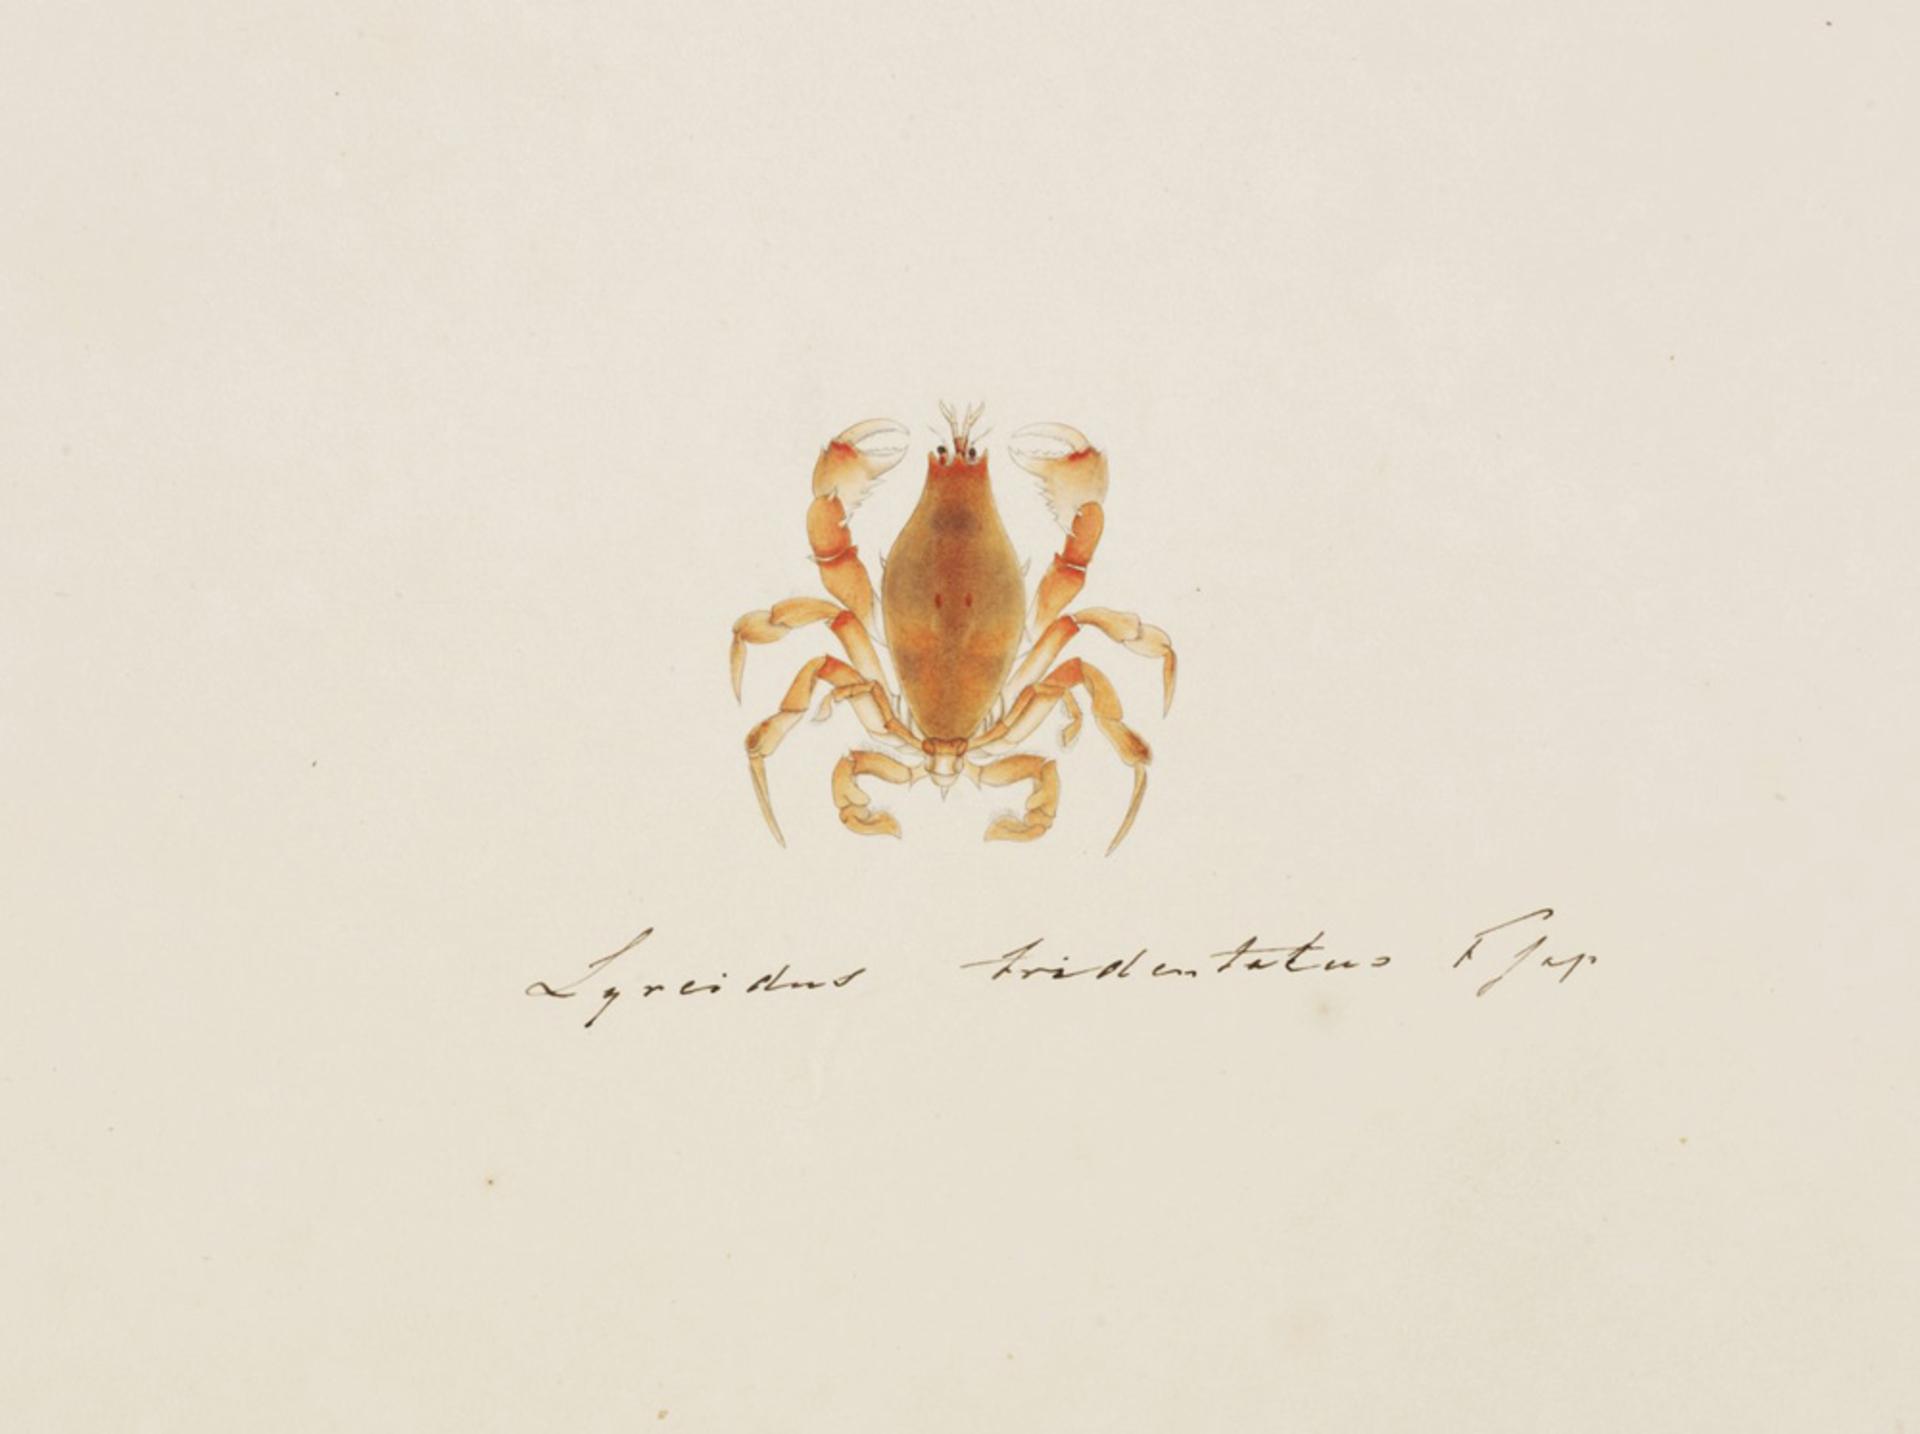 RMNH.ART.95 | Lyreidus brevifrons